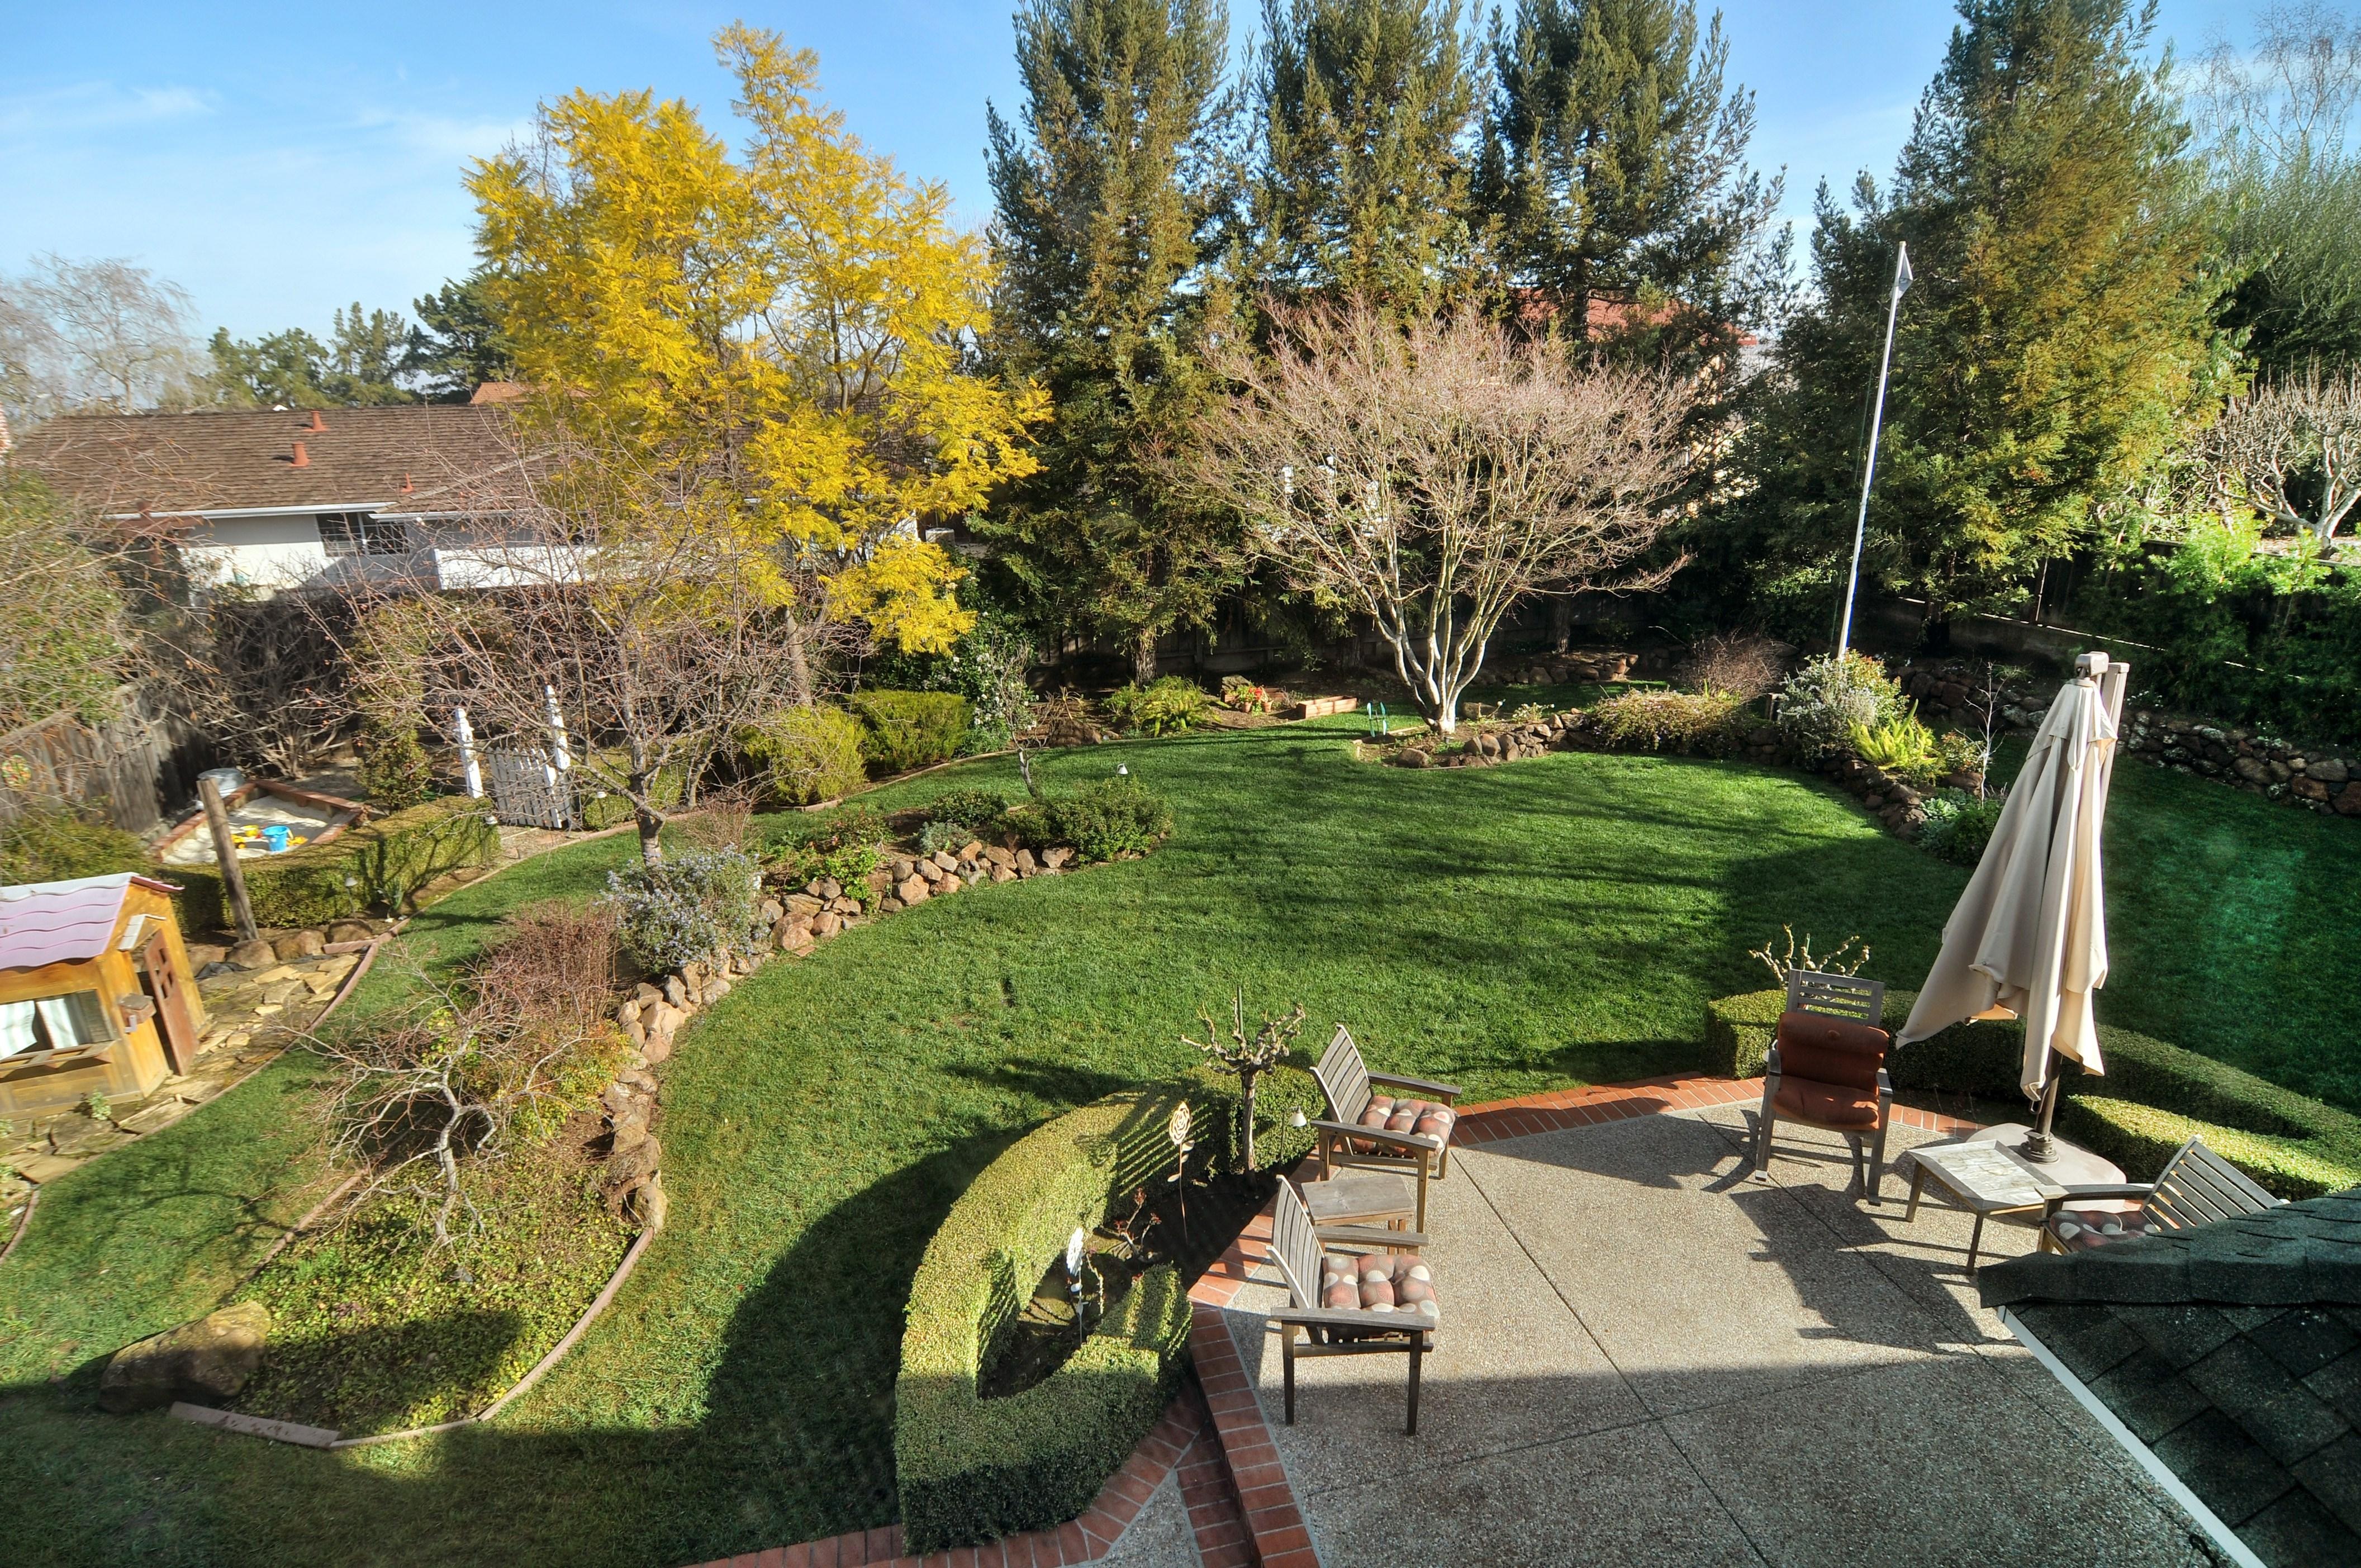 030 Backyard - Exquisite, expansive, remodeled Belwood home - 127 Belhaven Drive, Los Gatos